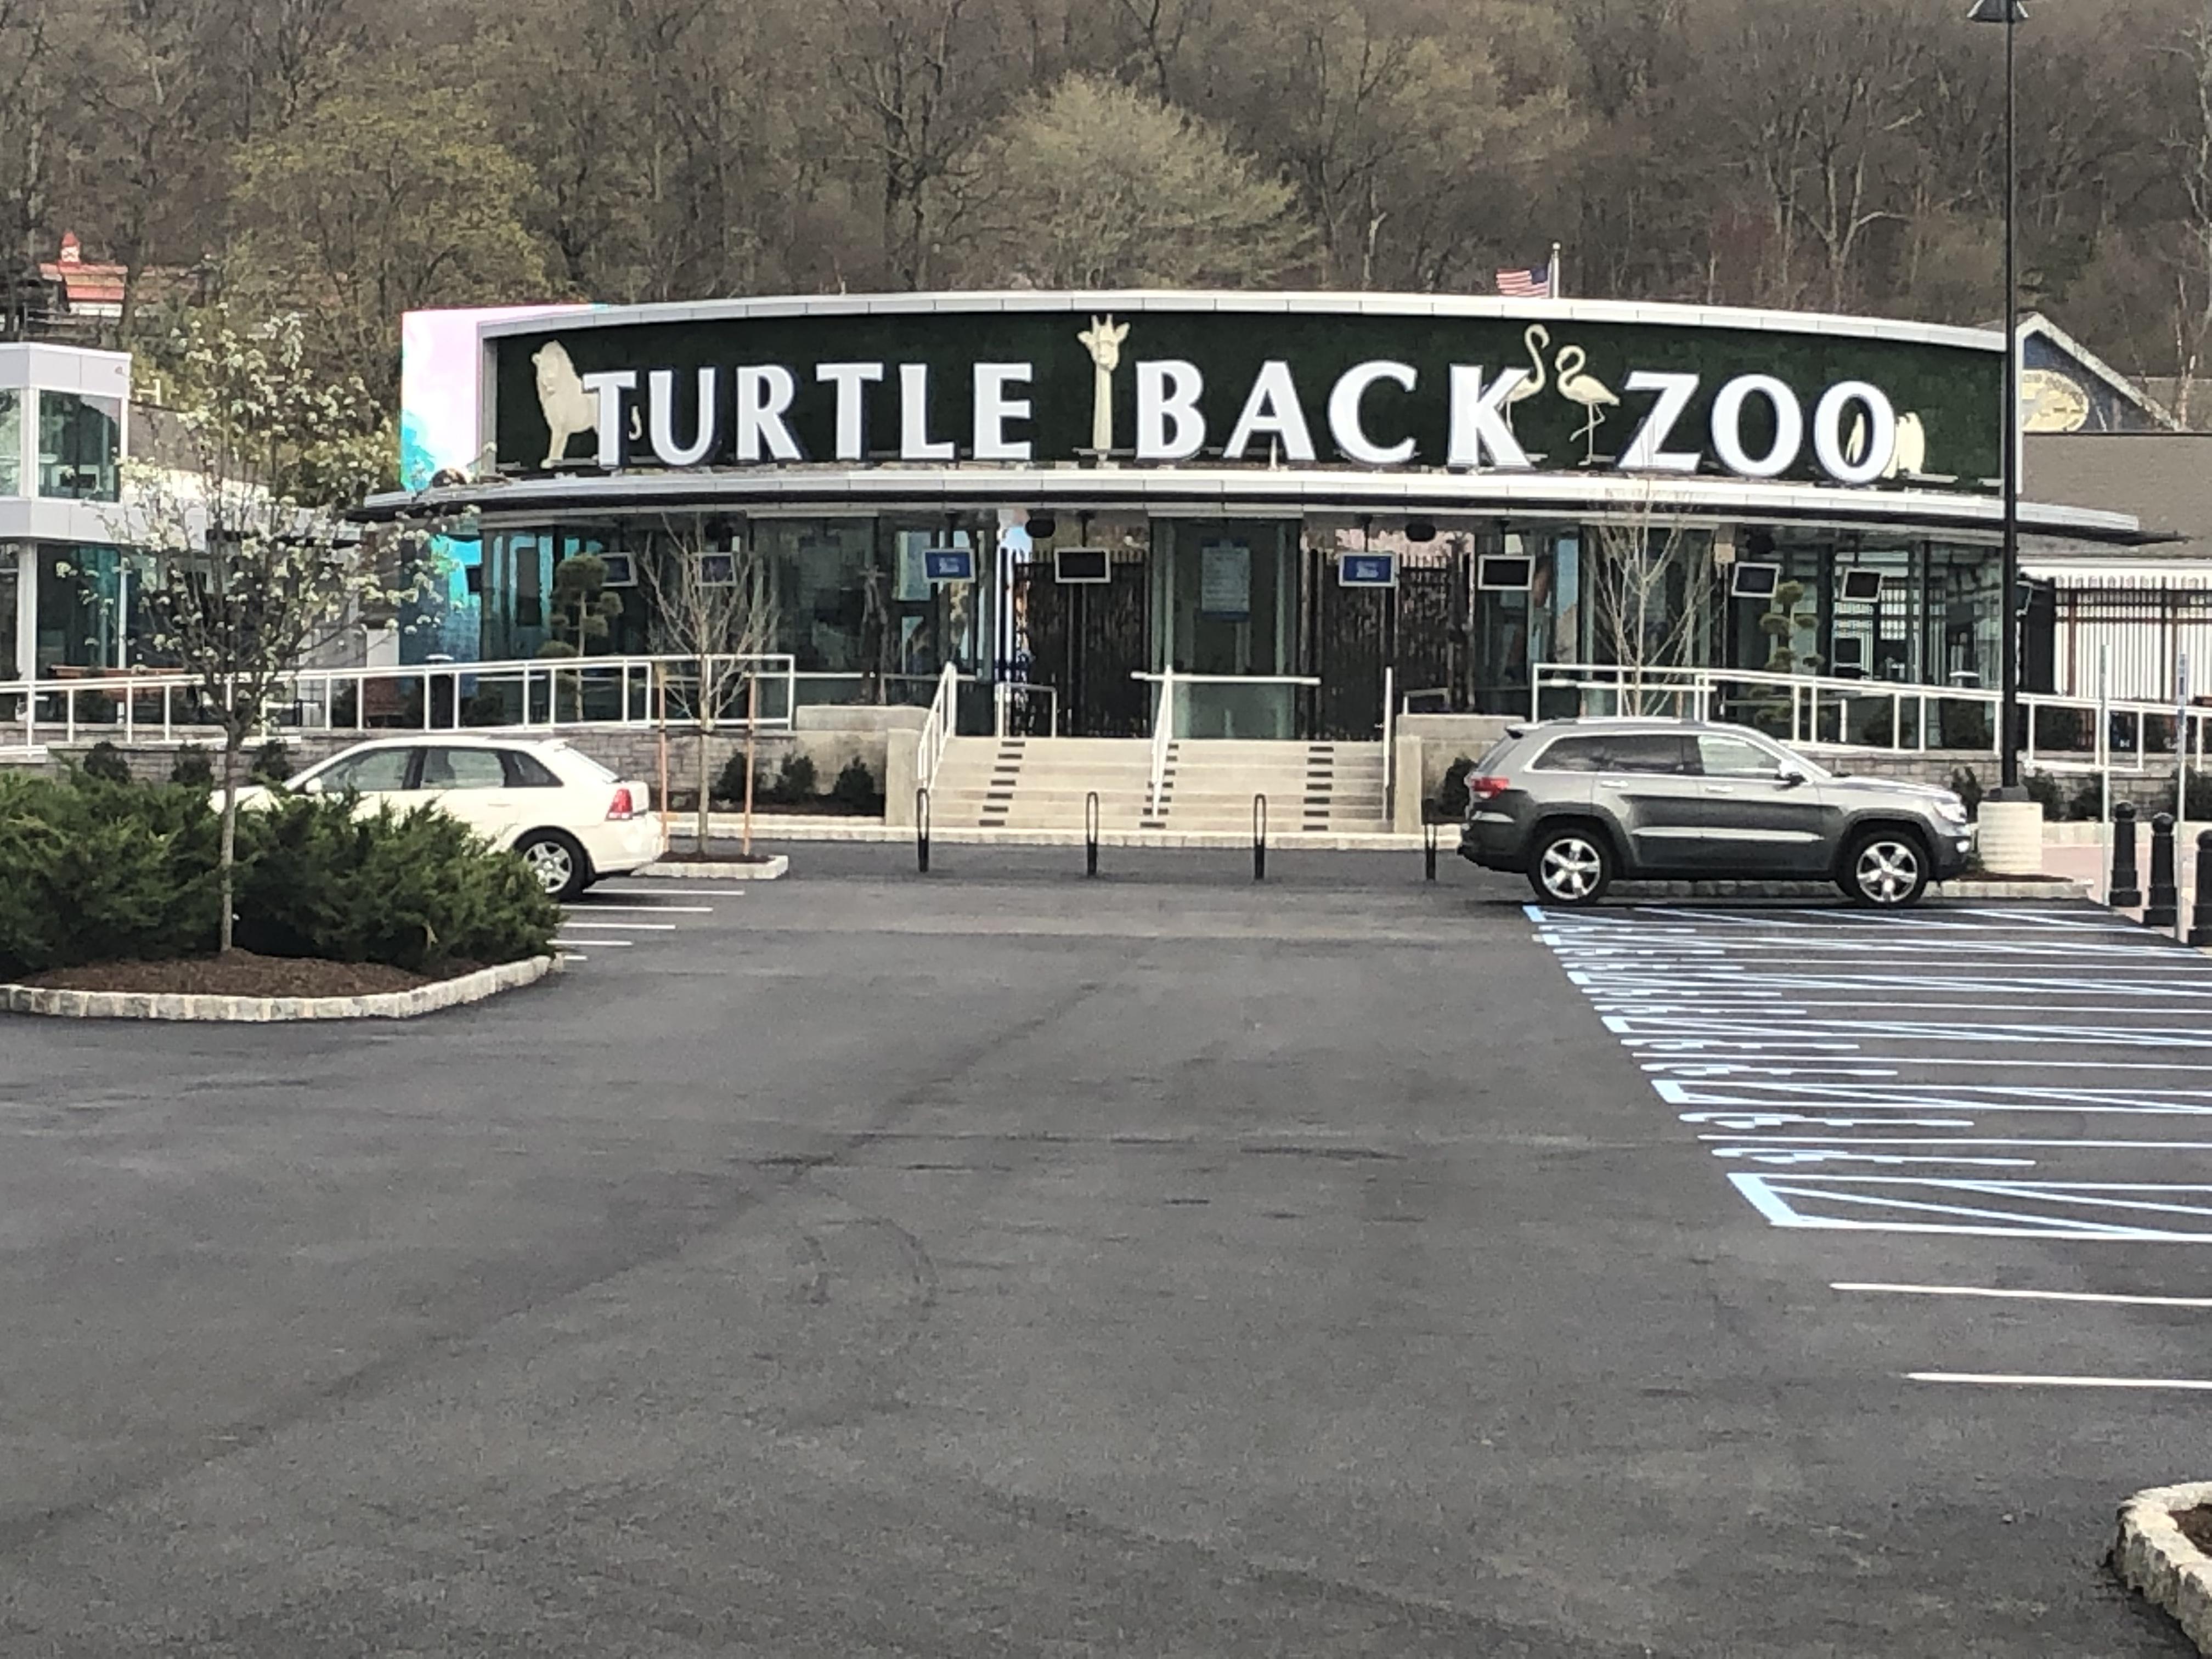 Turtle Back Zoo Christmas Lights 2019.File Turtle Back Zoo Entrance 2019 Jpg Wikimedia Commons